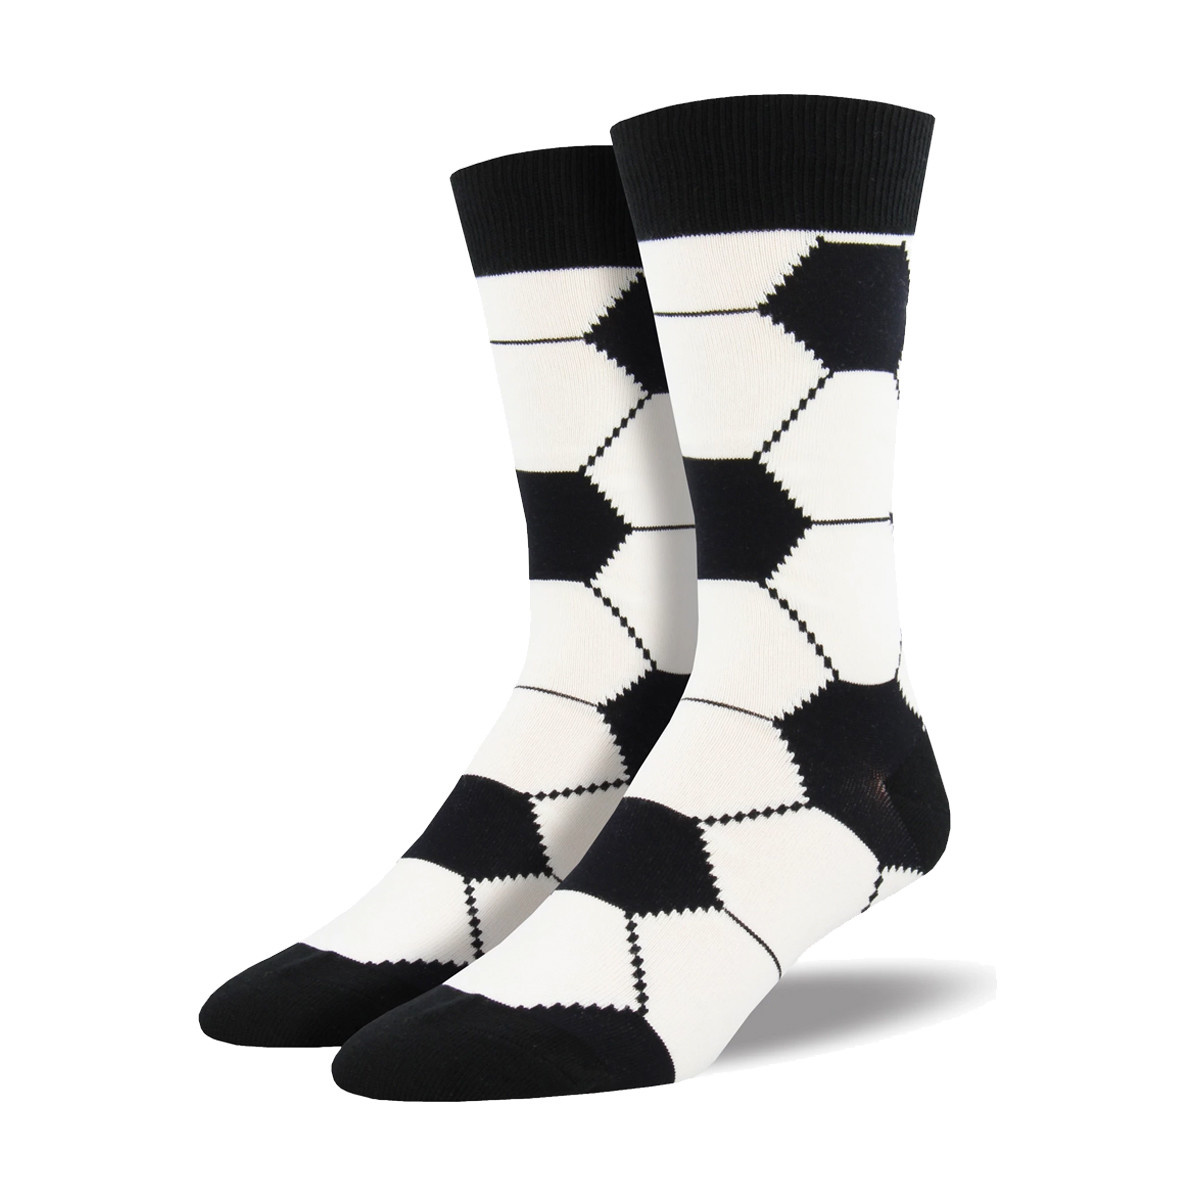 Socksmith Socksmith Men's Cotton Crew Socks Goal!